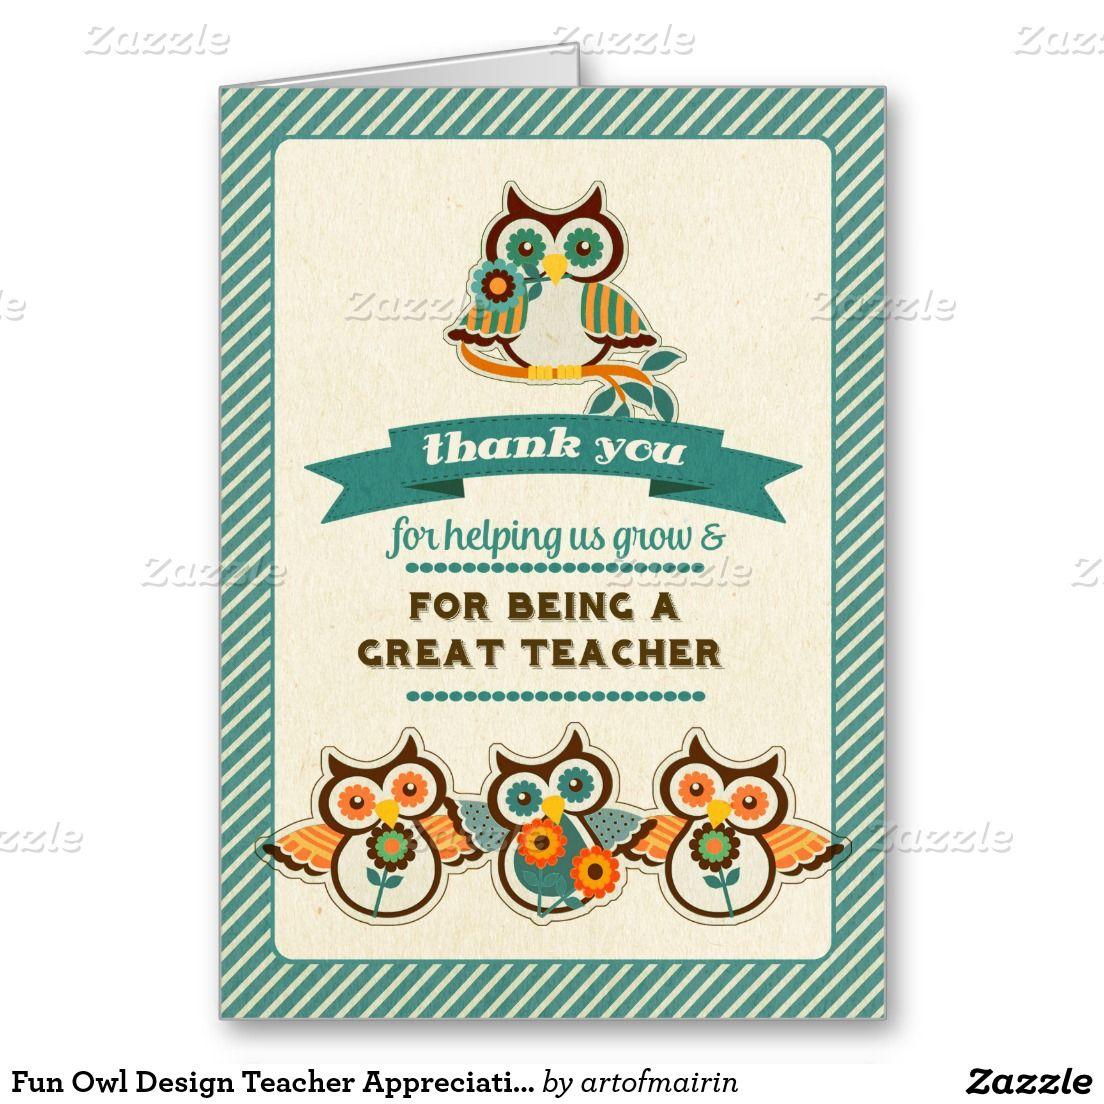 Fun Owl Design Teacher Appreciation Week Cards Appreciation And